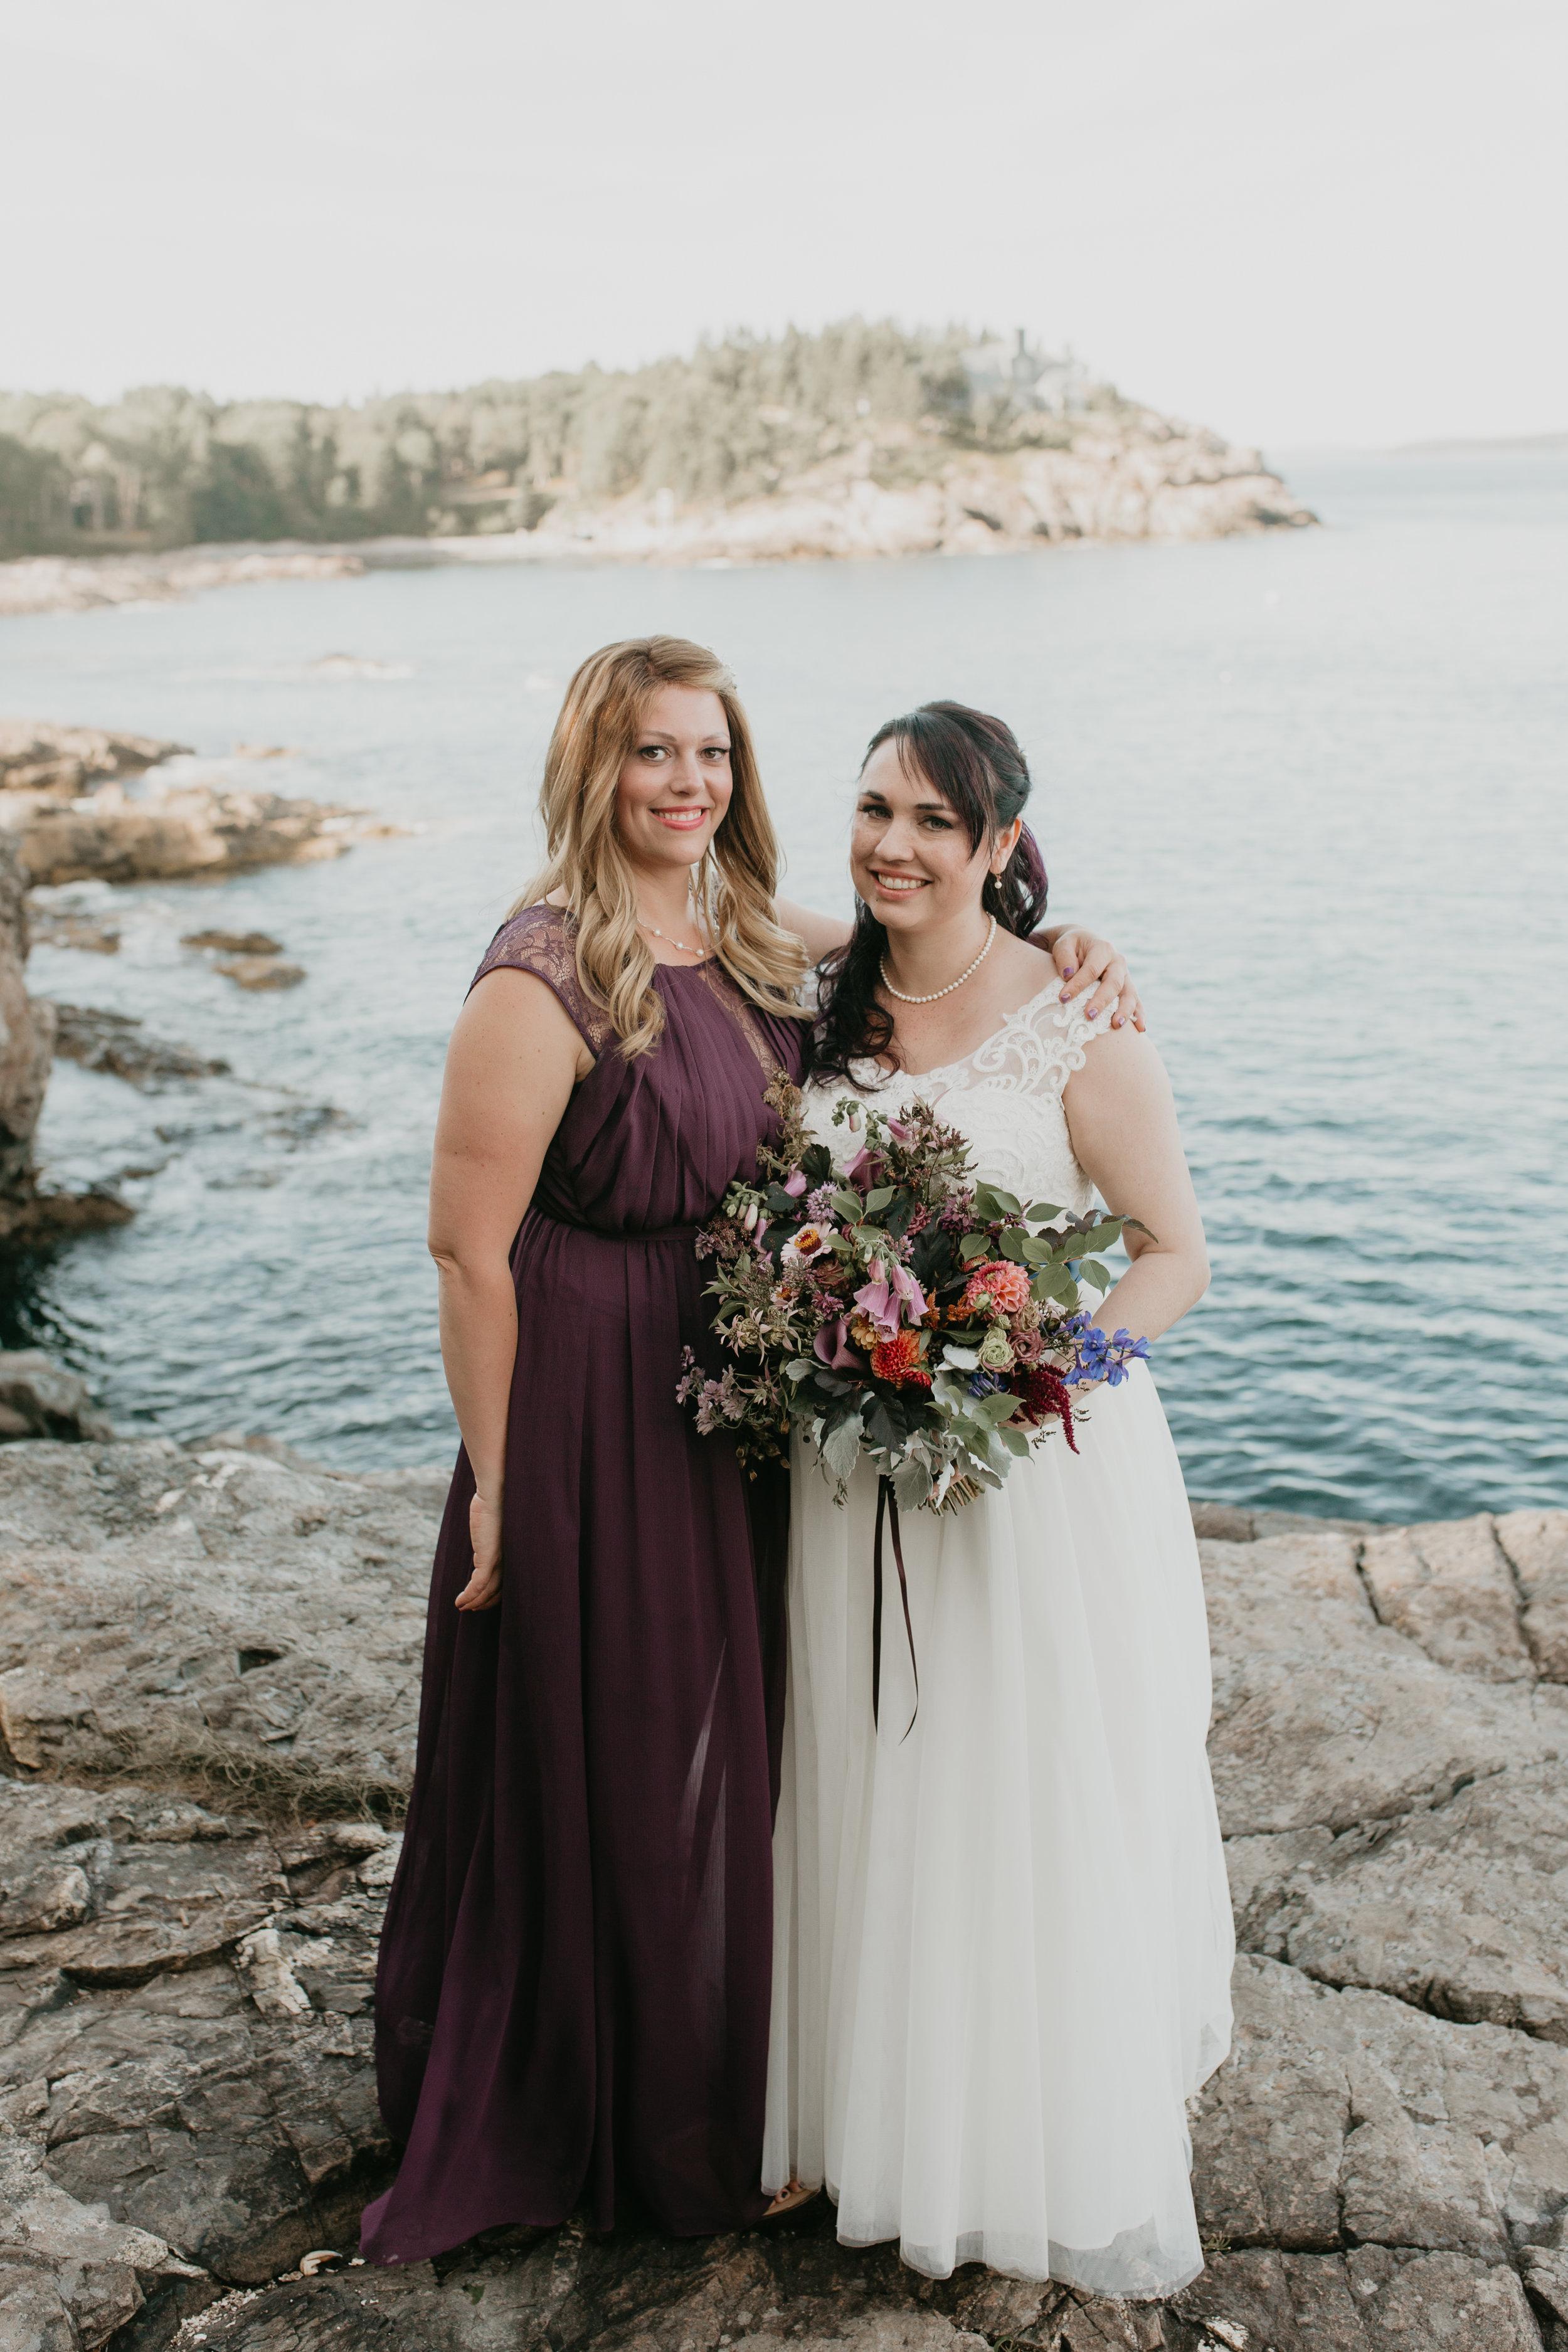 nicole-daacke-photography-Elopement-rocky-shoreline-coast-Acadia-National-Park-elopement-photographer-inspiration-maine-elopement-otter-cliffs-schoonic-head-point-30.jpg